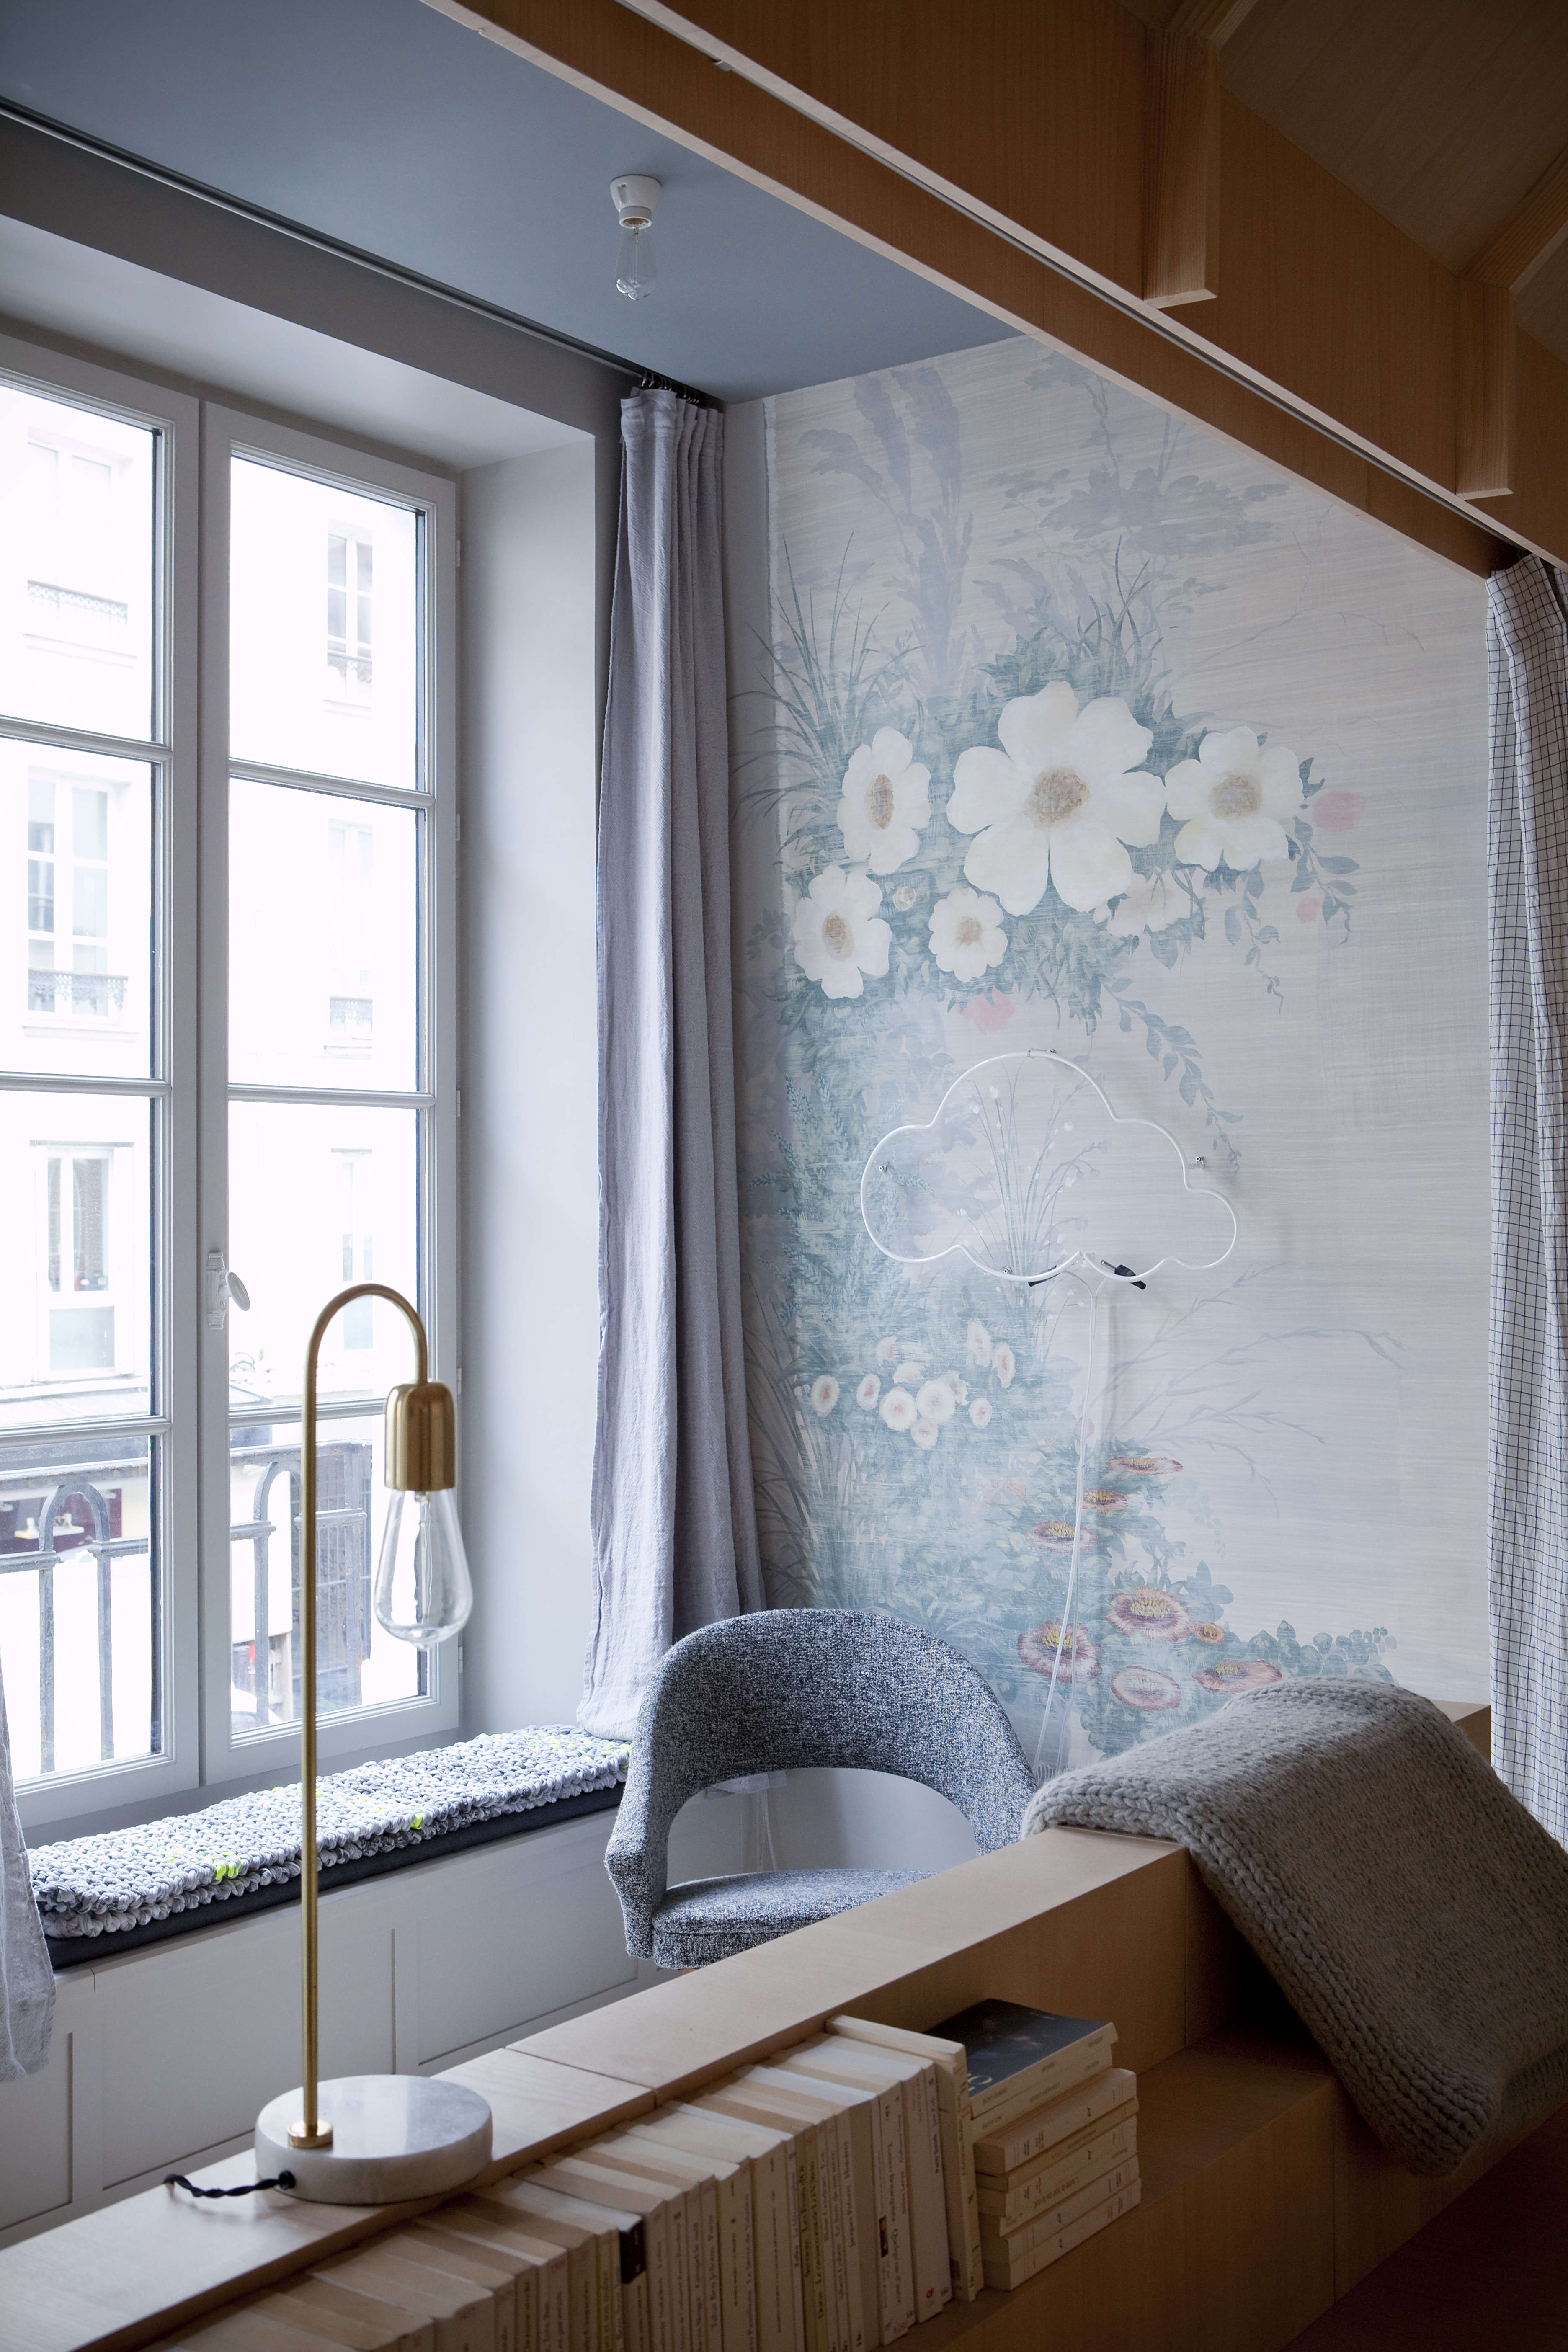 Chez-Marie-Sixtine-Paris-Remodelista-Julie-Ansiau-photo-11